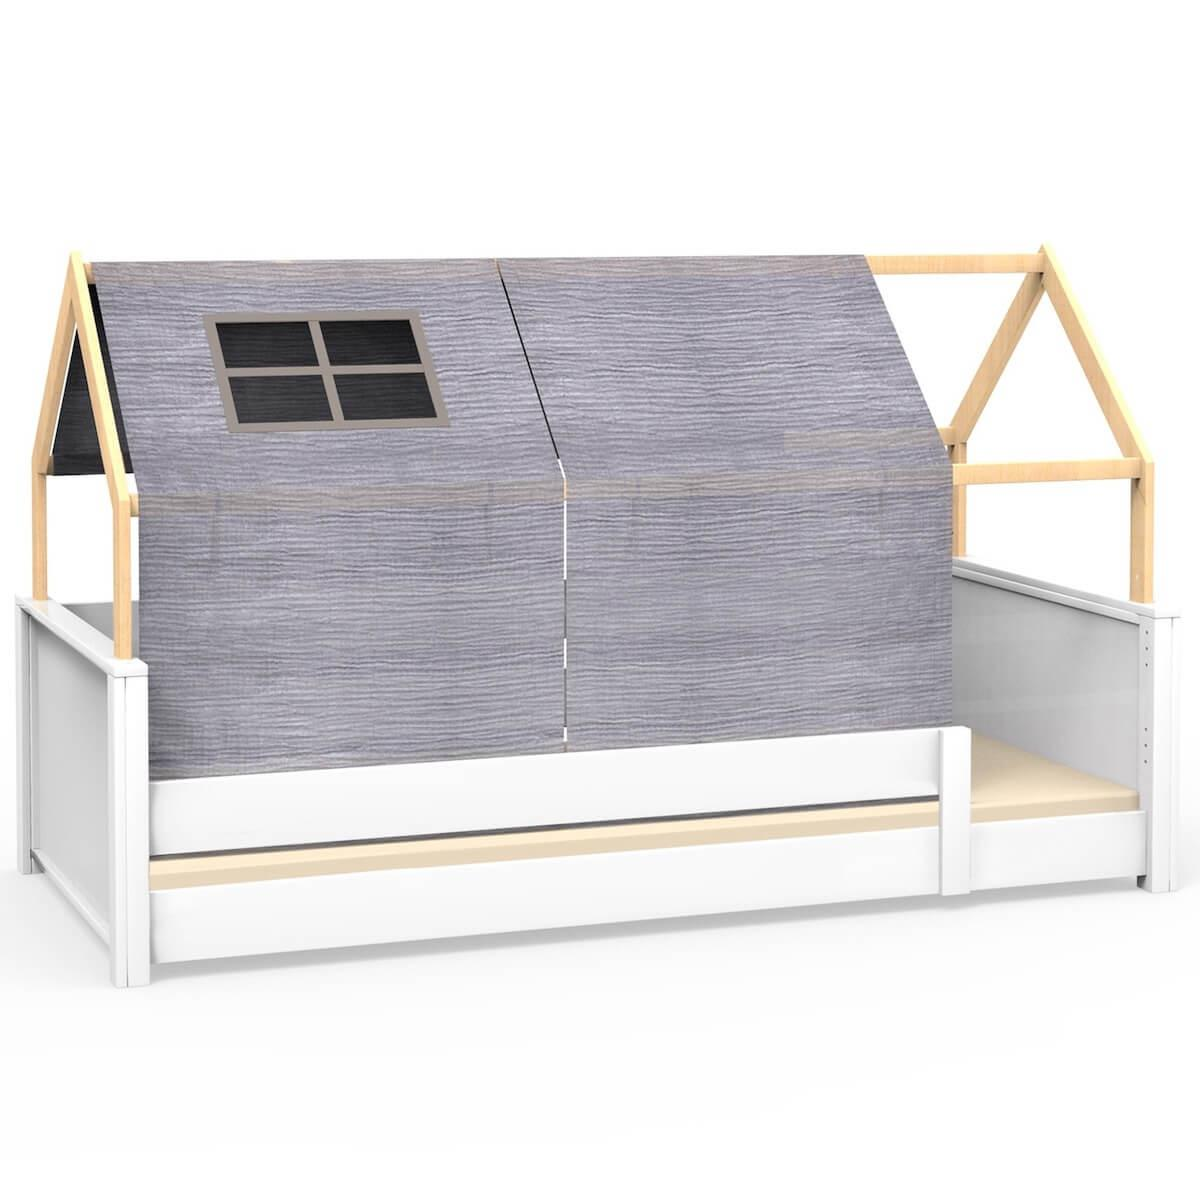 Dachbespannung mit Fenster KASVA Debreuyn Bobble grey